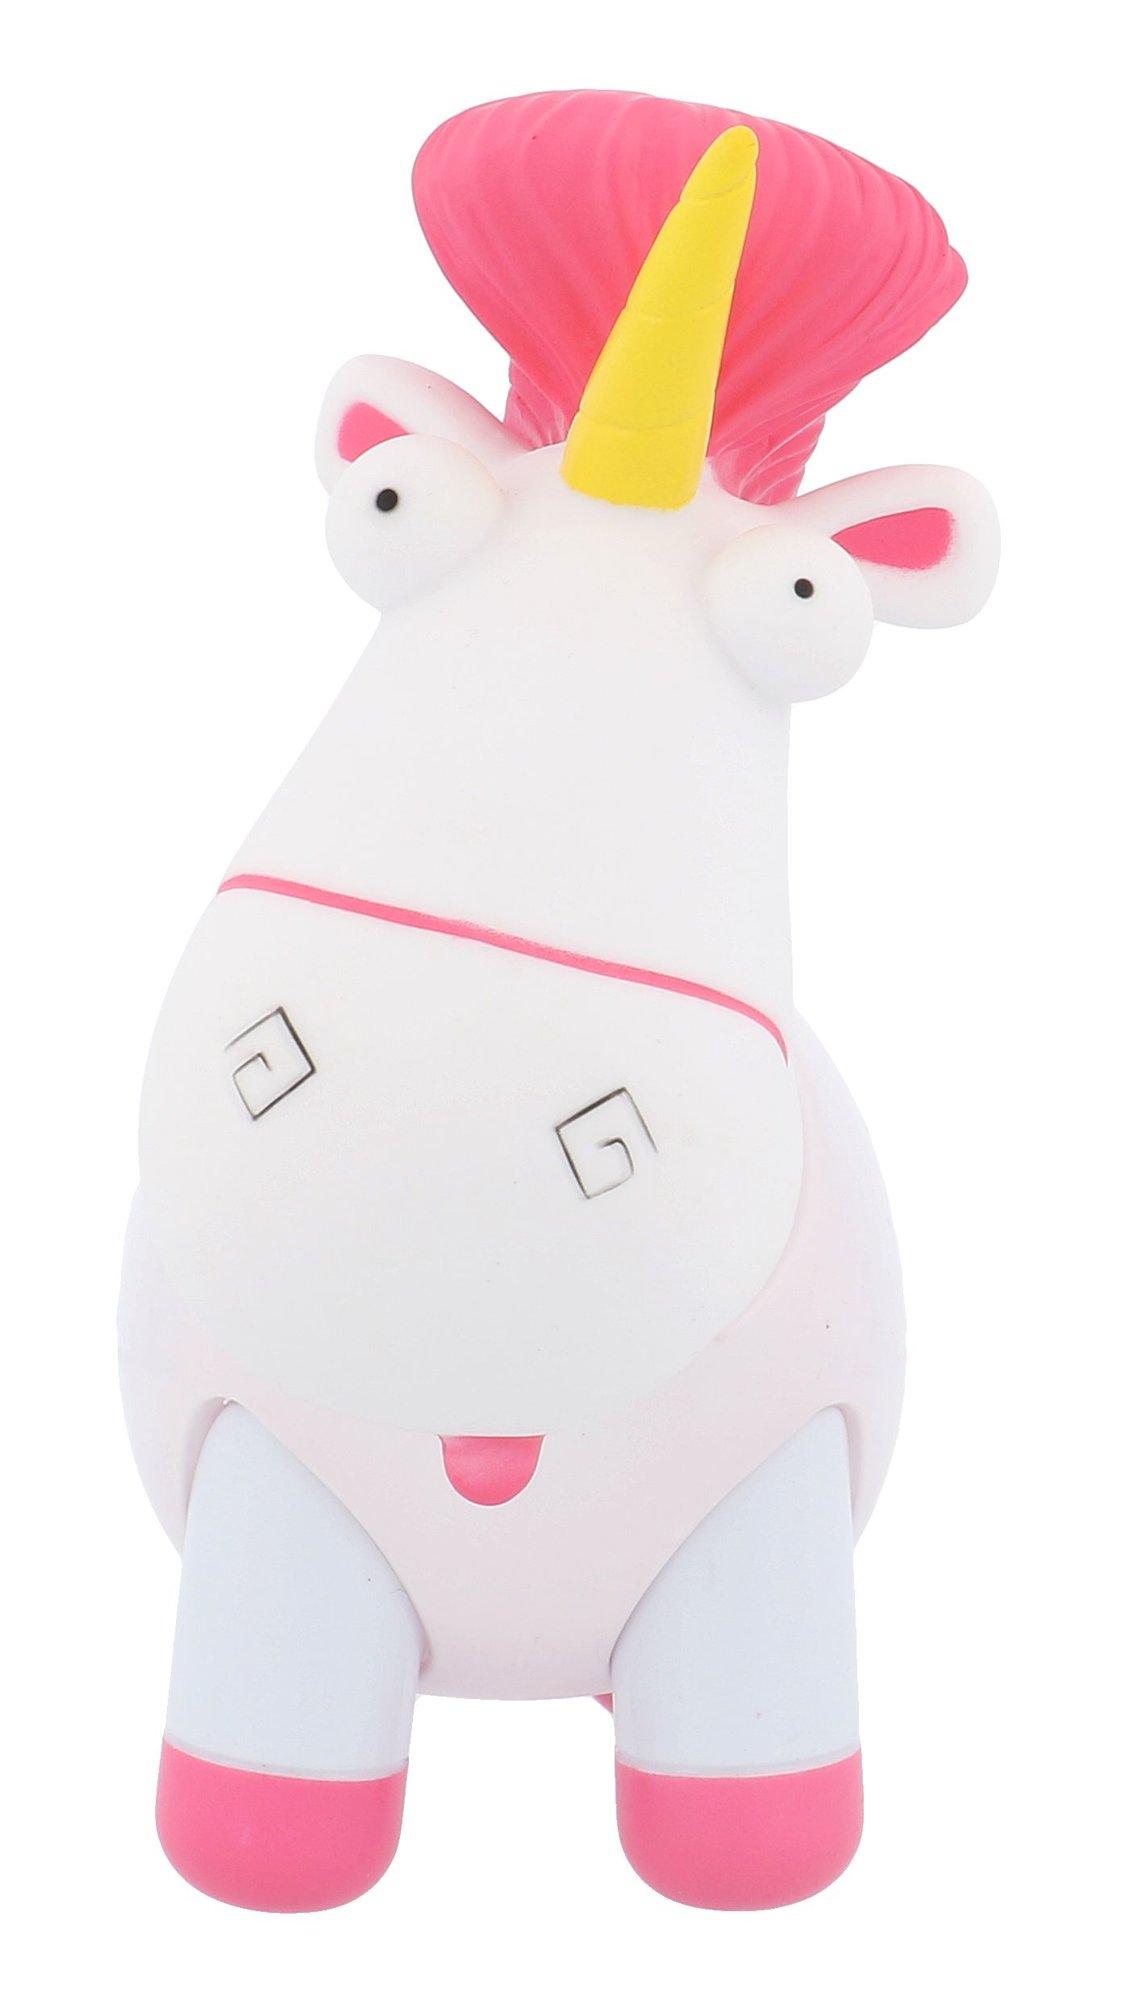 Minions Unicorns Cosmetic 350ml  3D